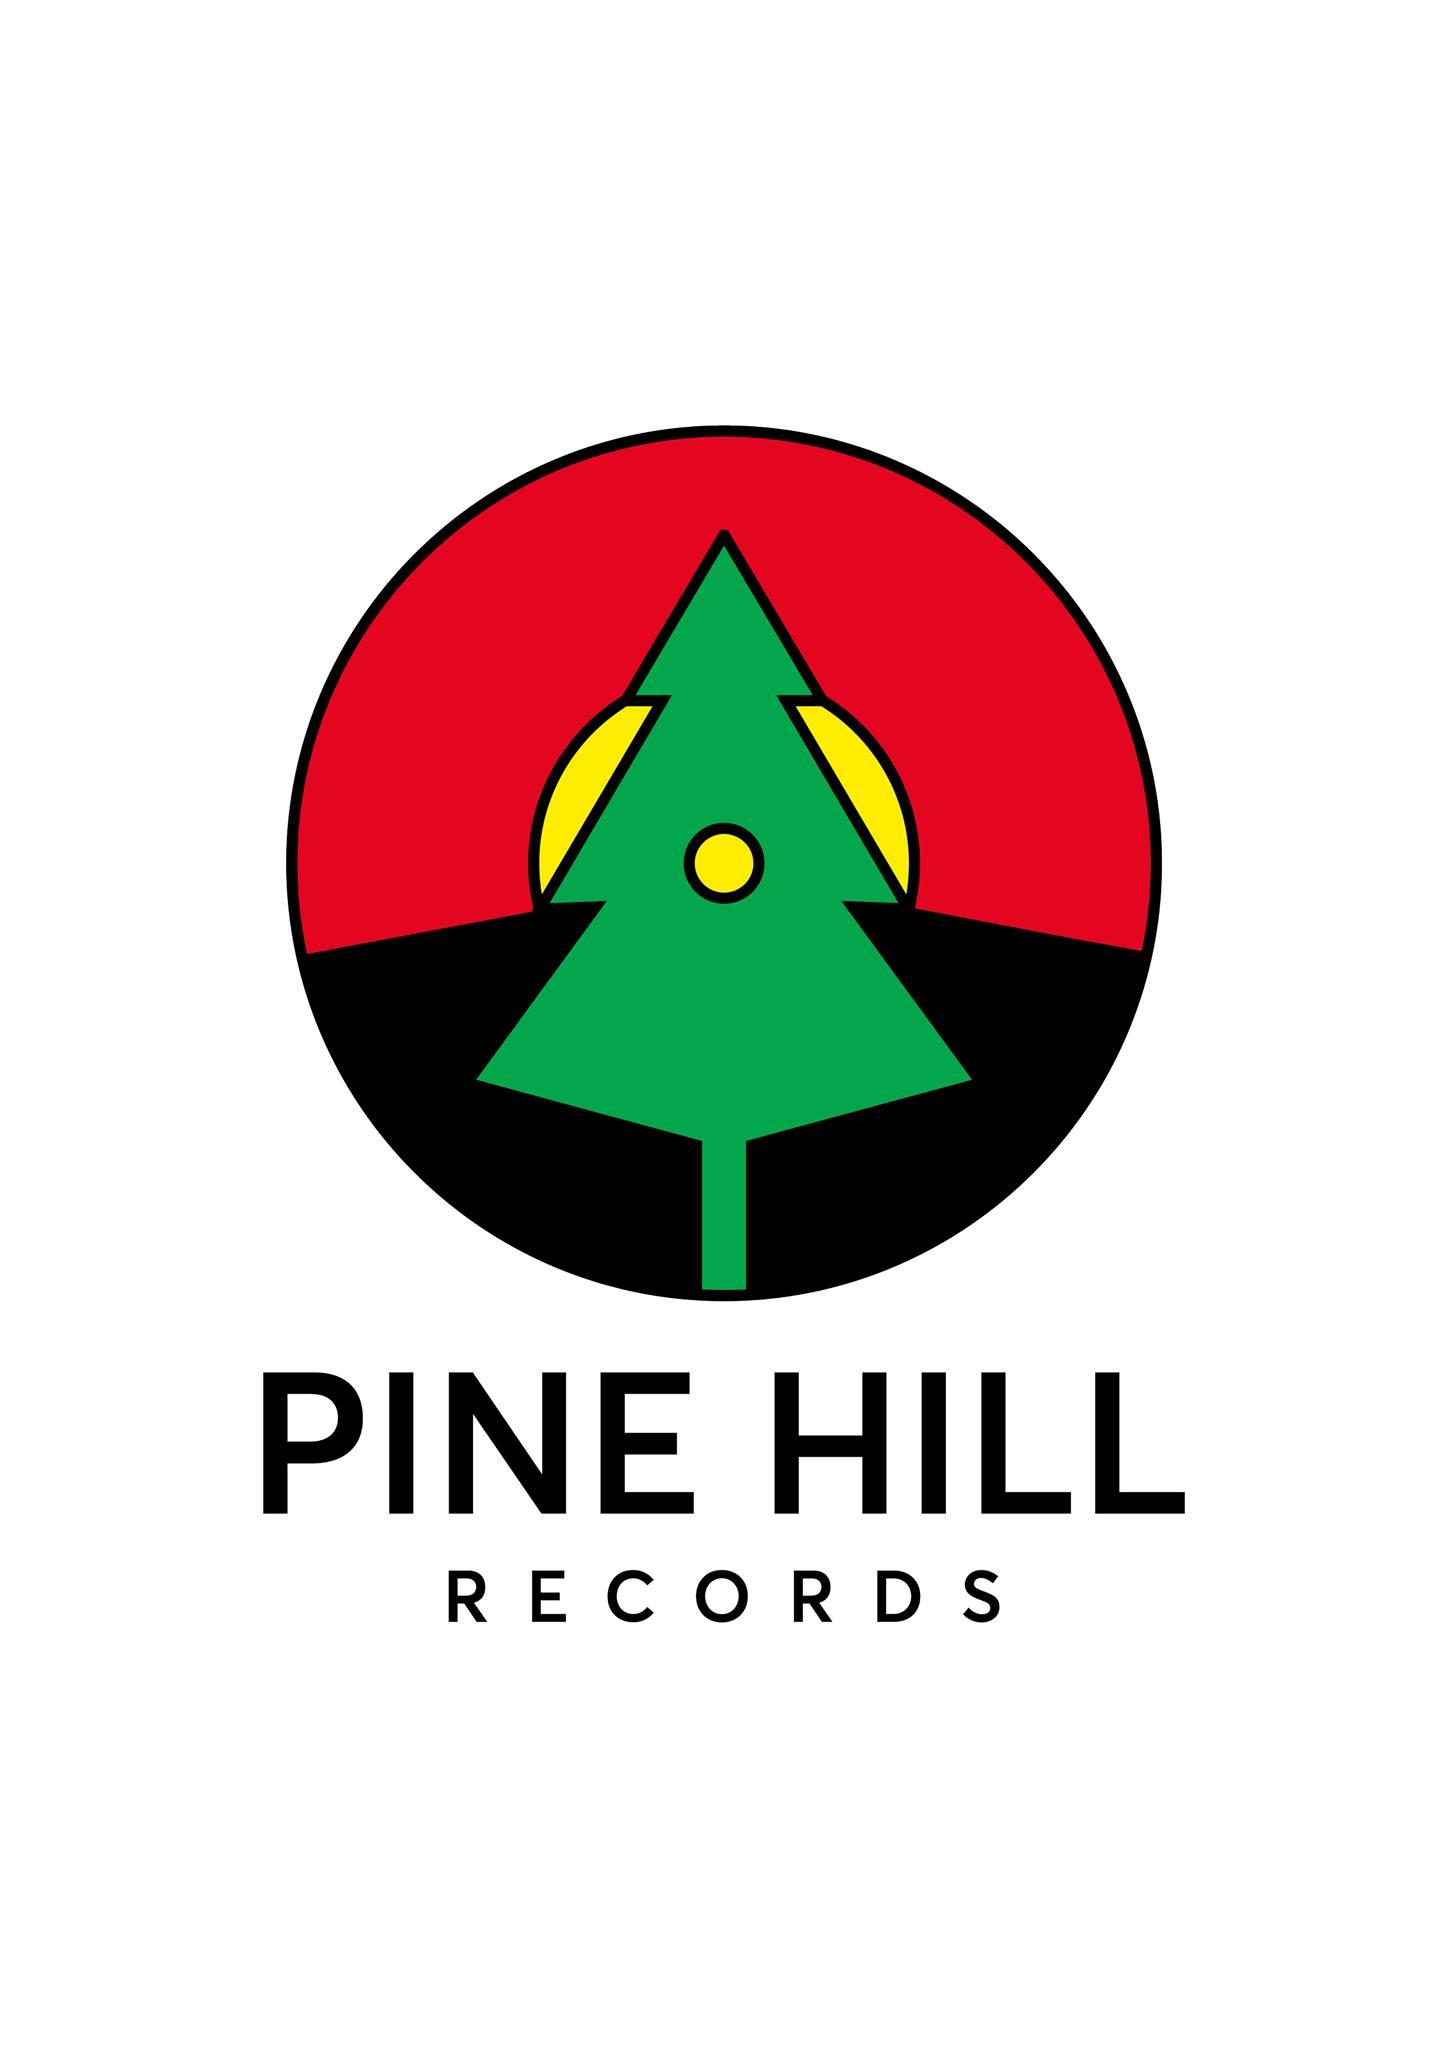 Pine Hill Records - Logo